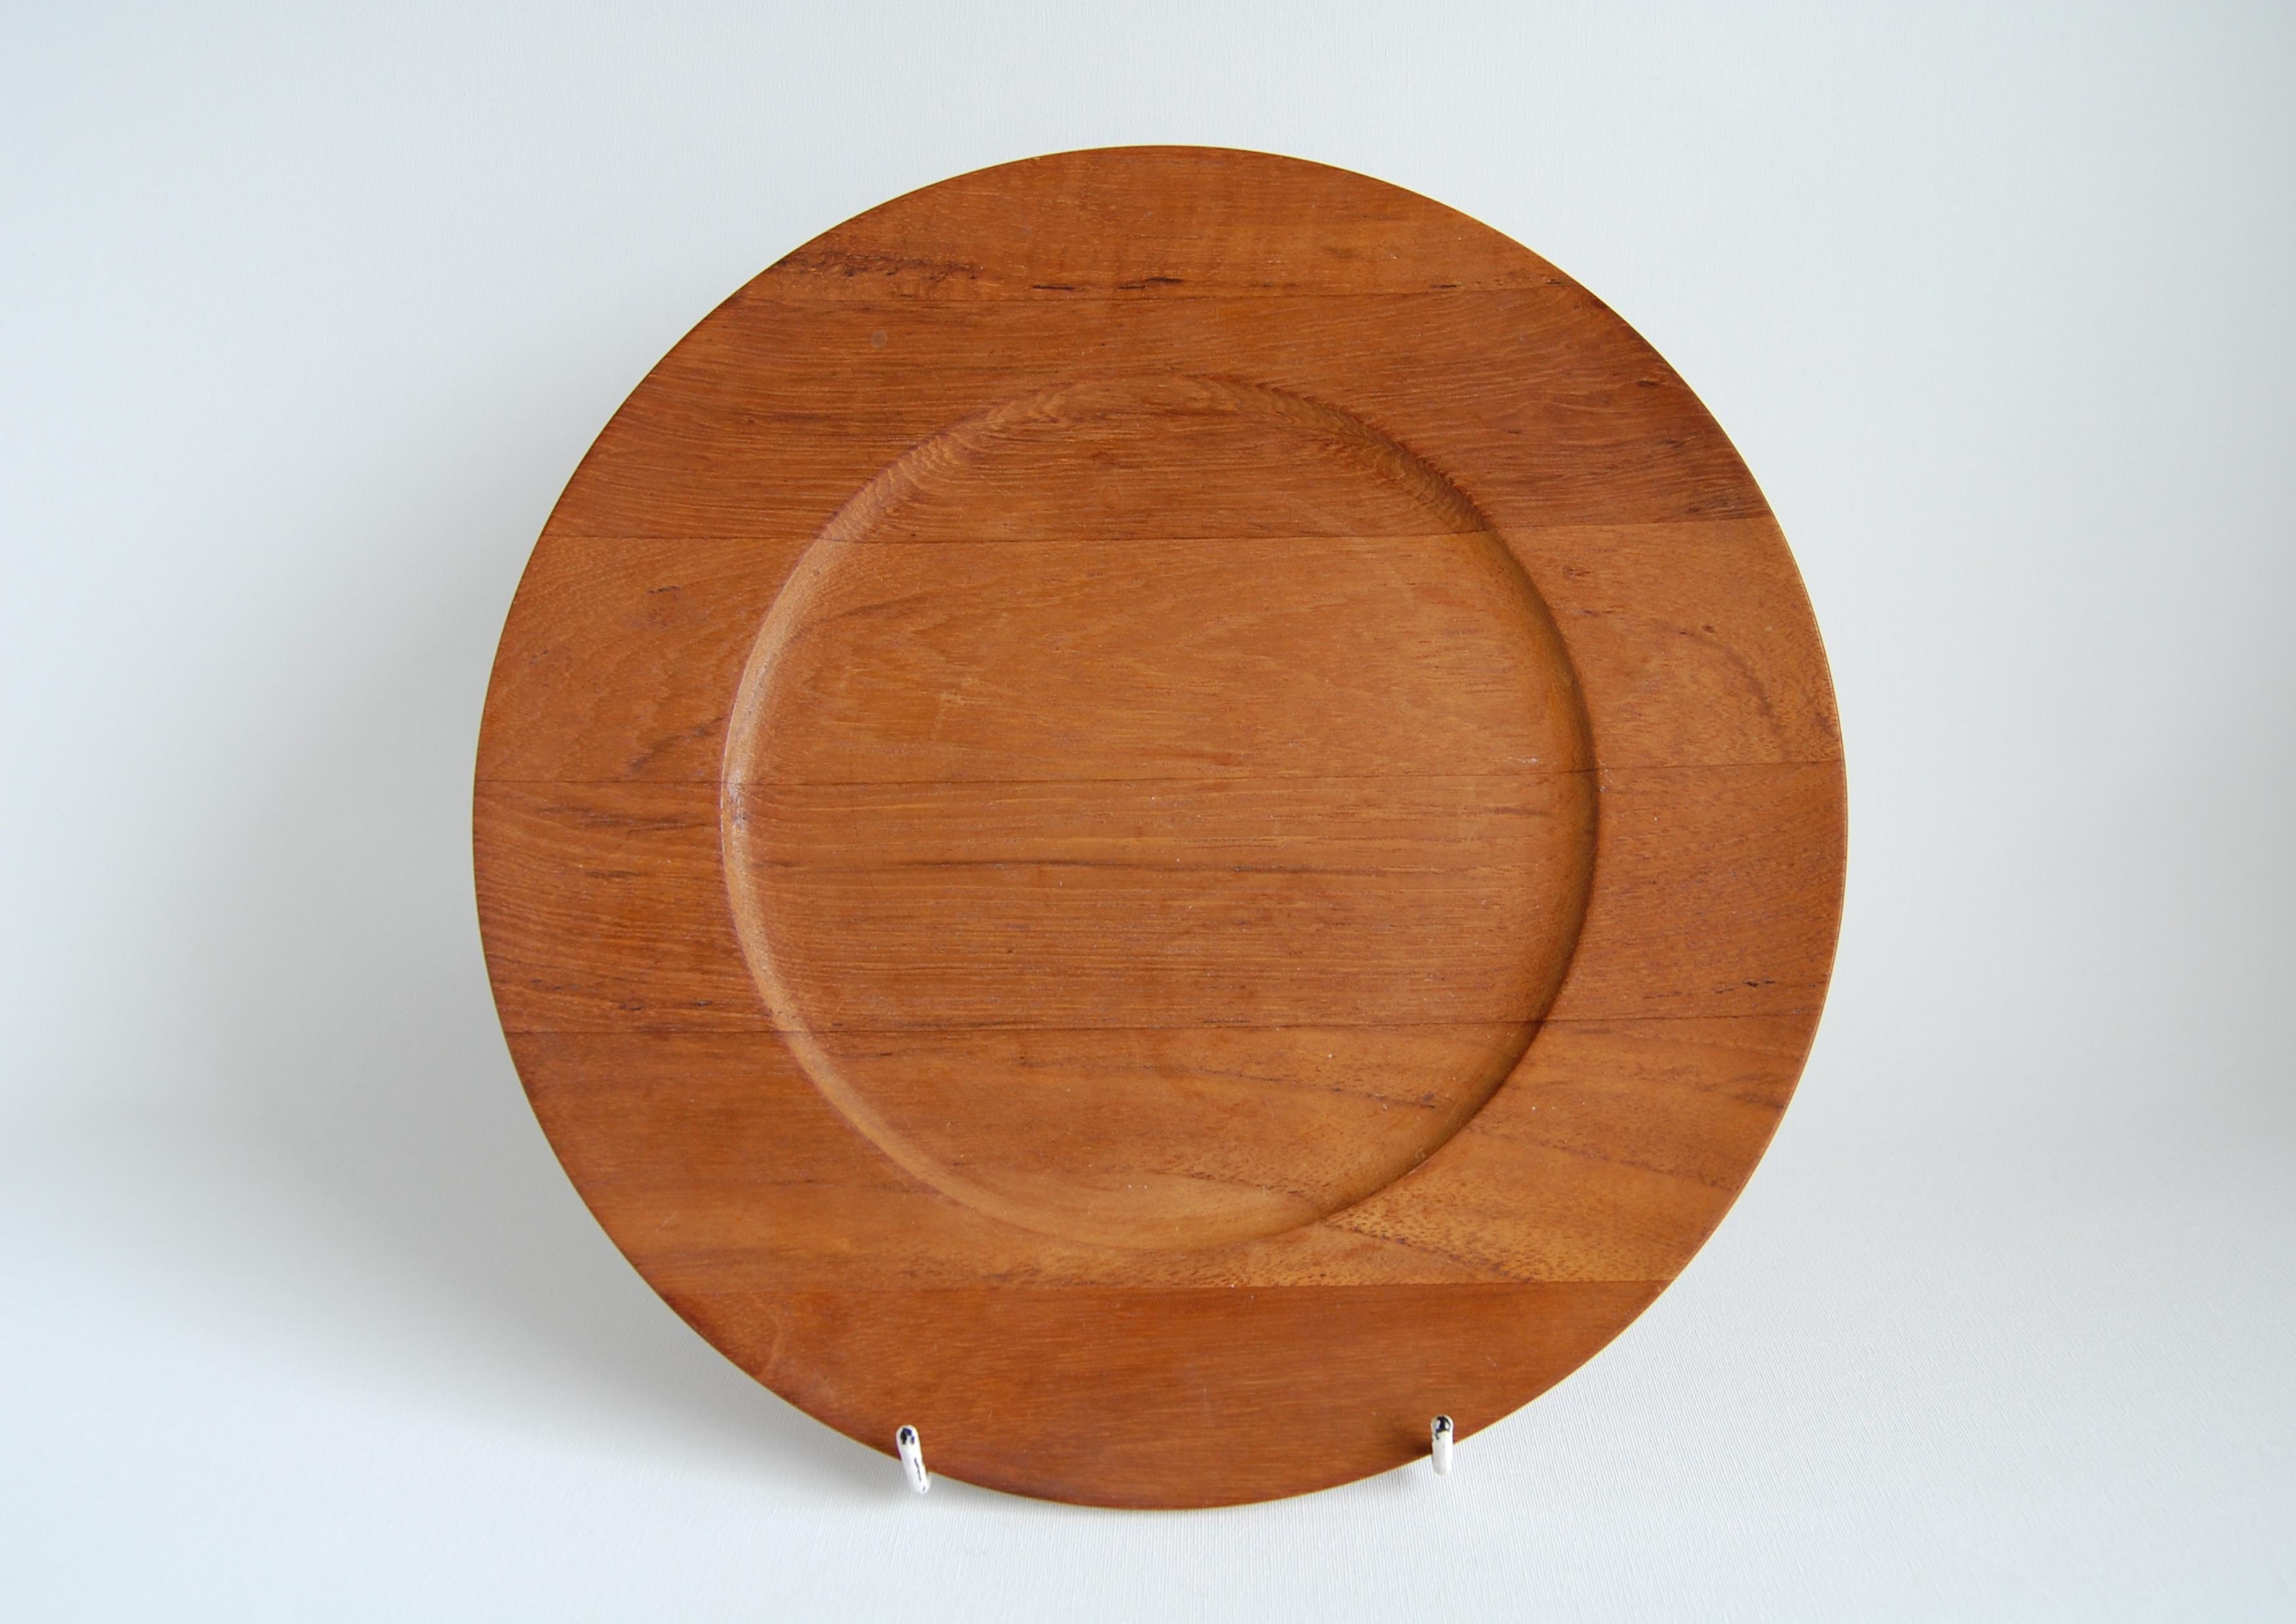 Kronjyden/クロニーデン Jens H. Quistgaard/イェンス H クイストゴー Wooden Plate/ウッドプレート 005